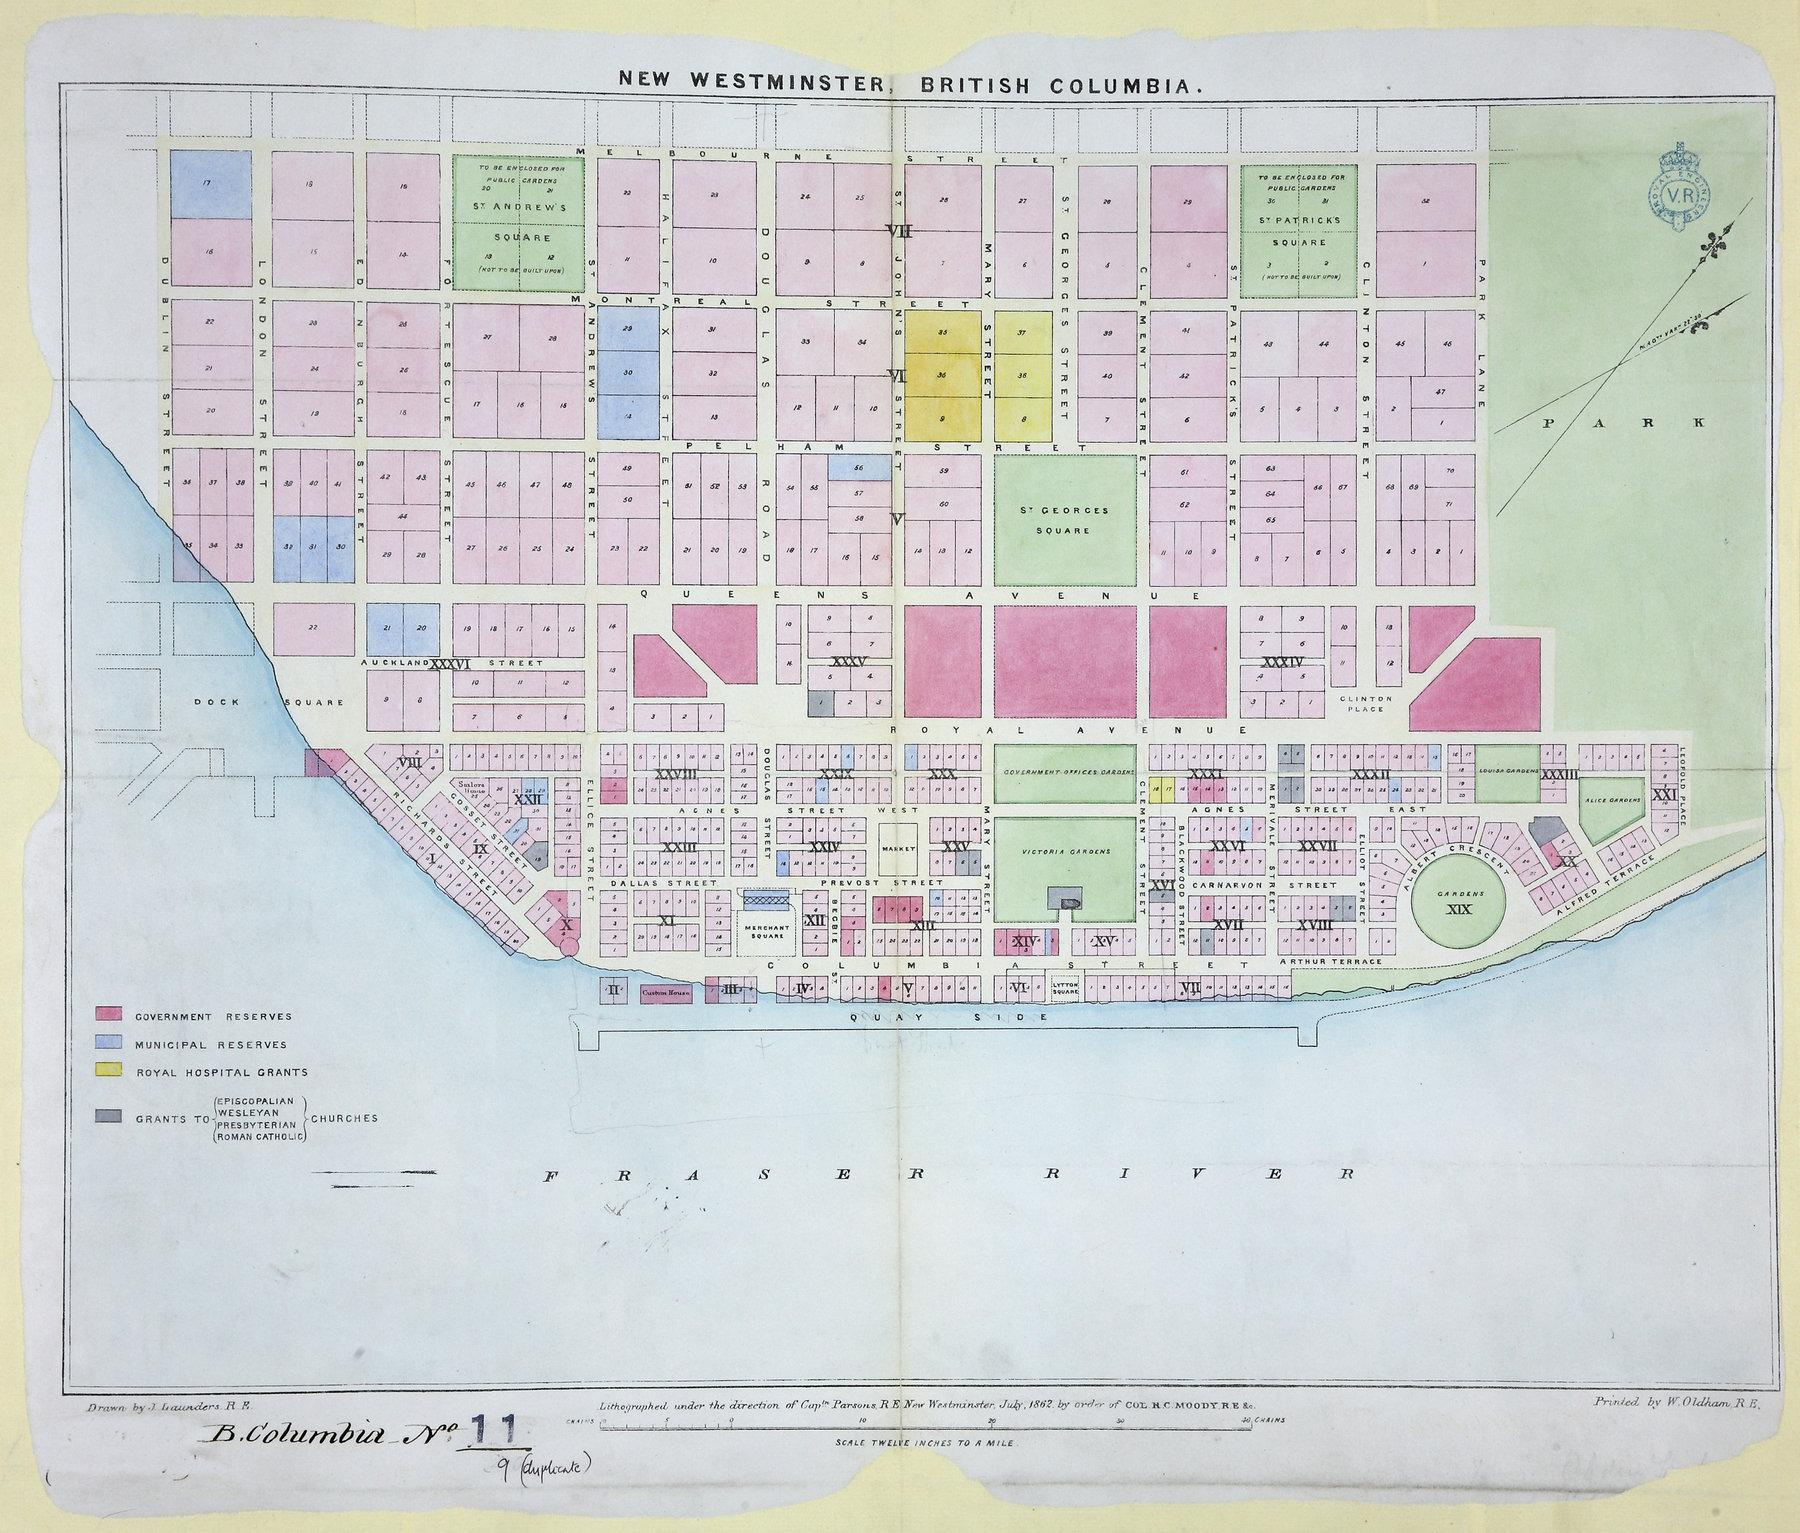 New Westminster, British Columbia, 1862.